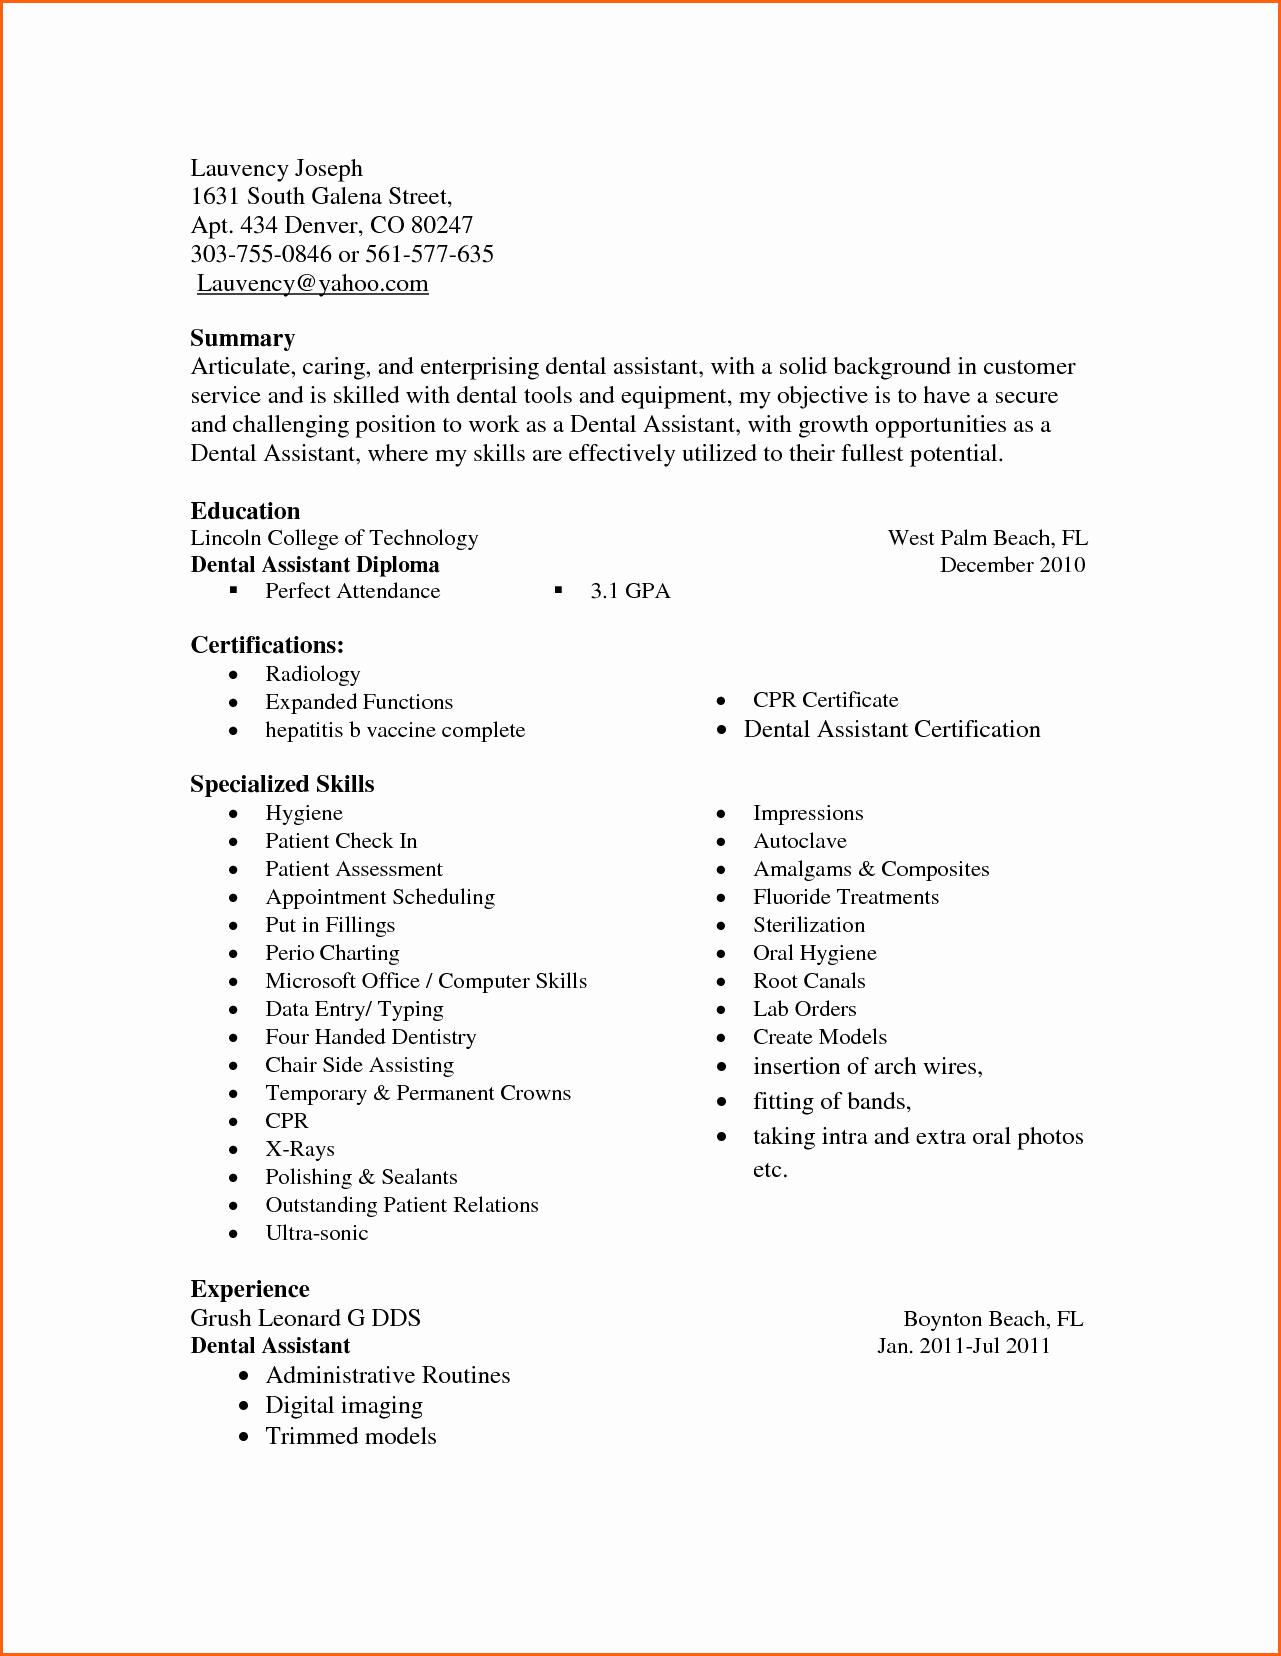 Microsoft Office Skills Resume Template Best Of List Microsoft Fice Skills Resume